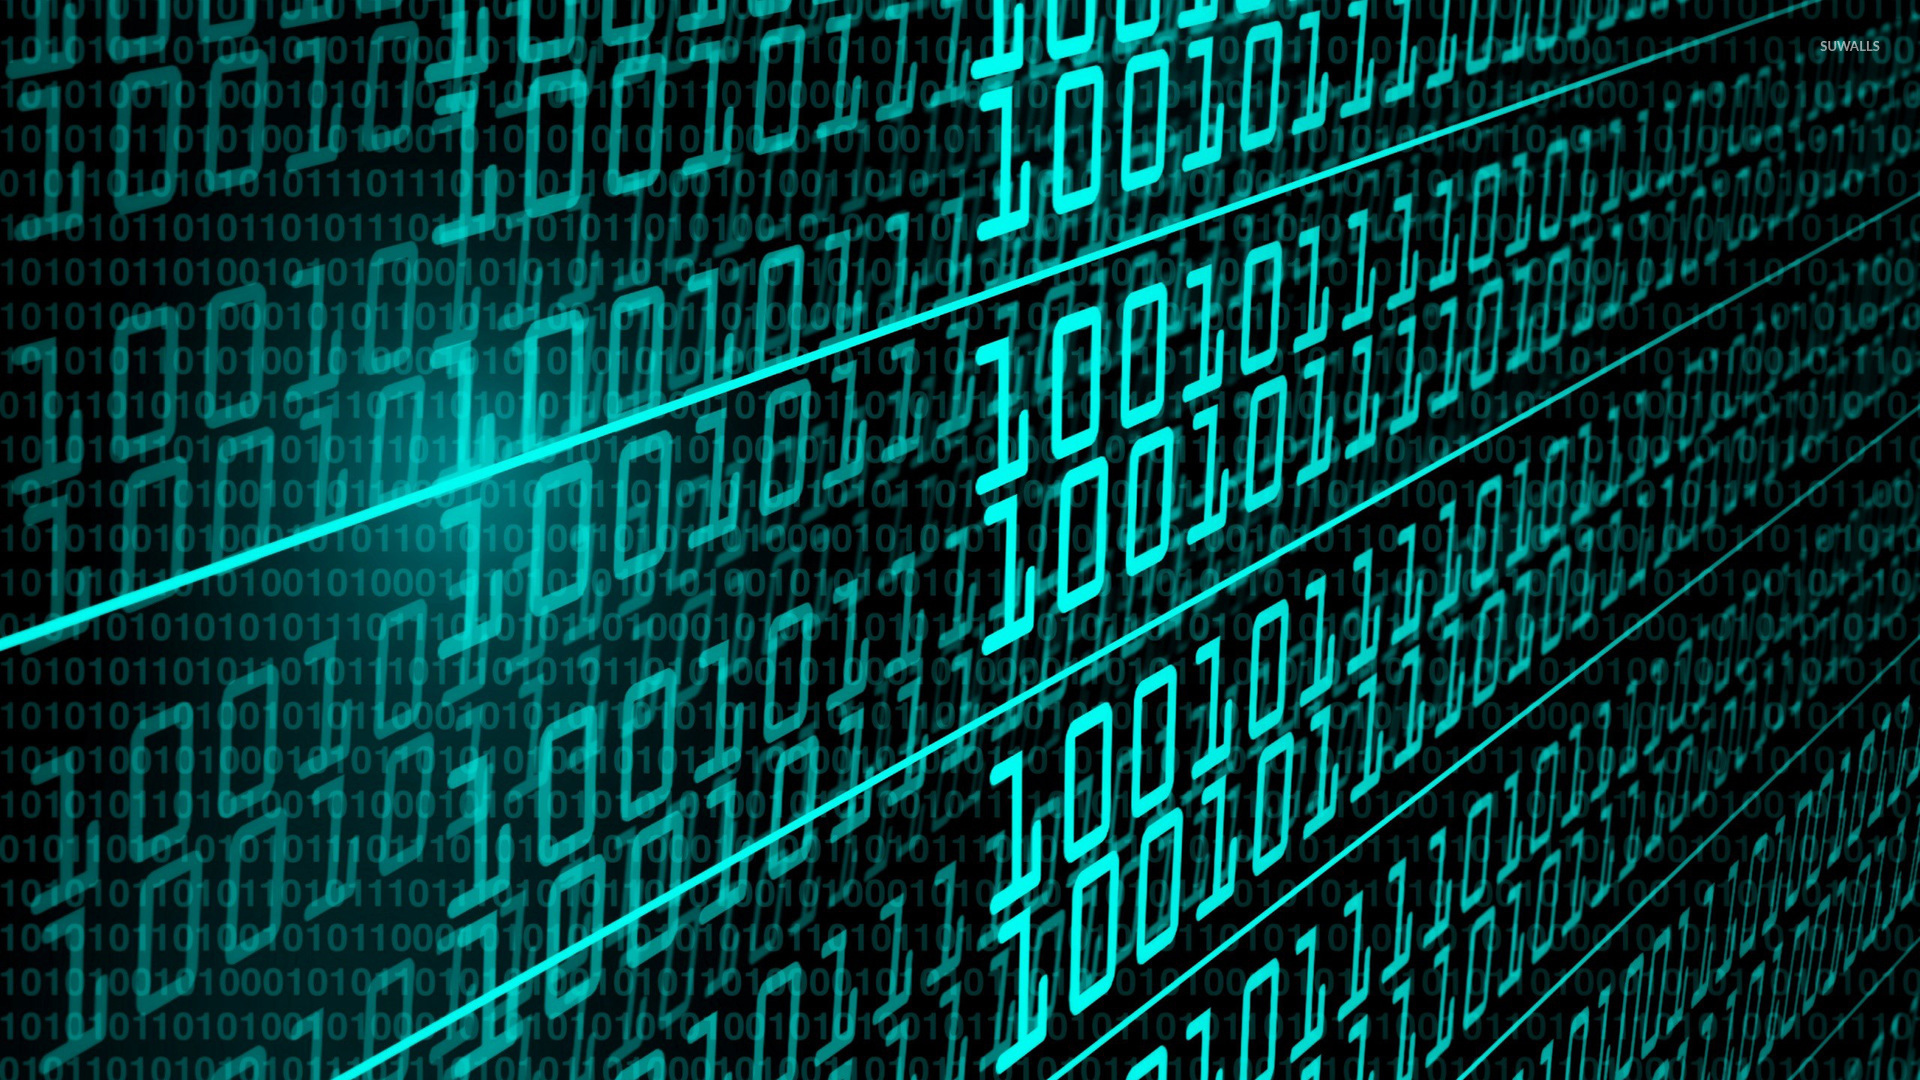 Free computer wallpaper, system failure matrix code wallpaper HTML ...